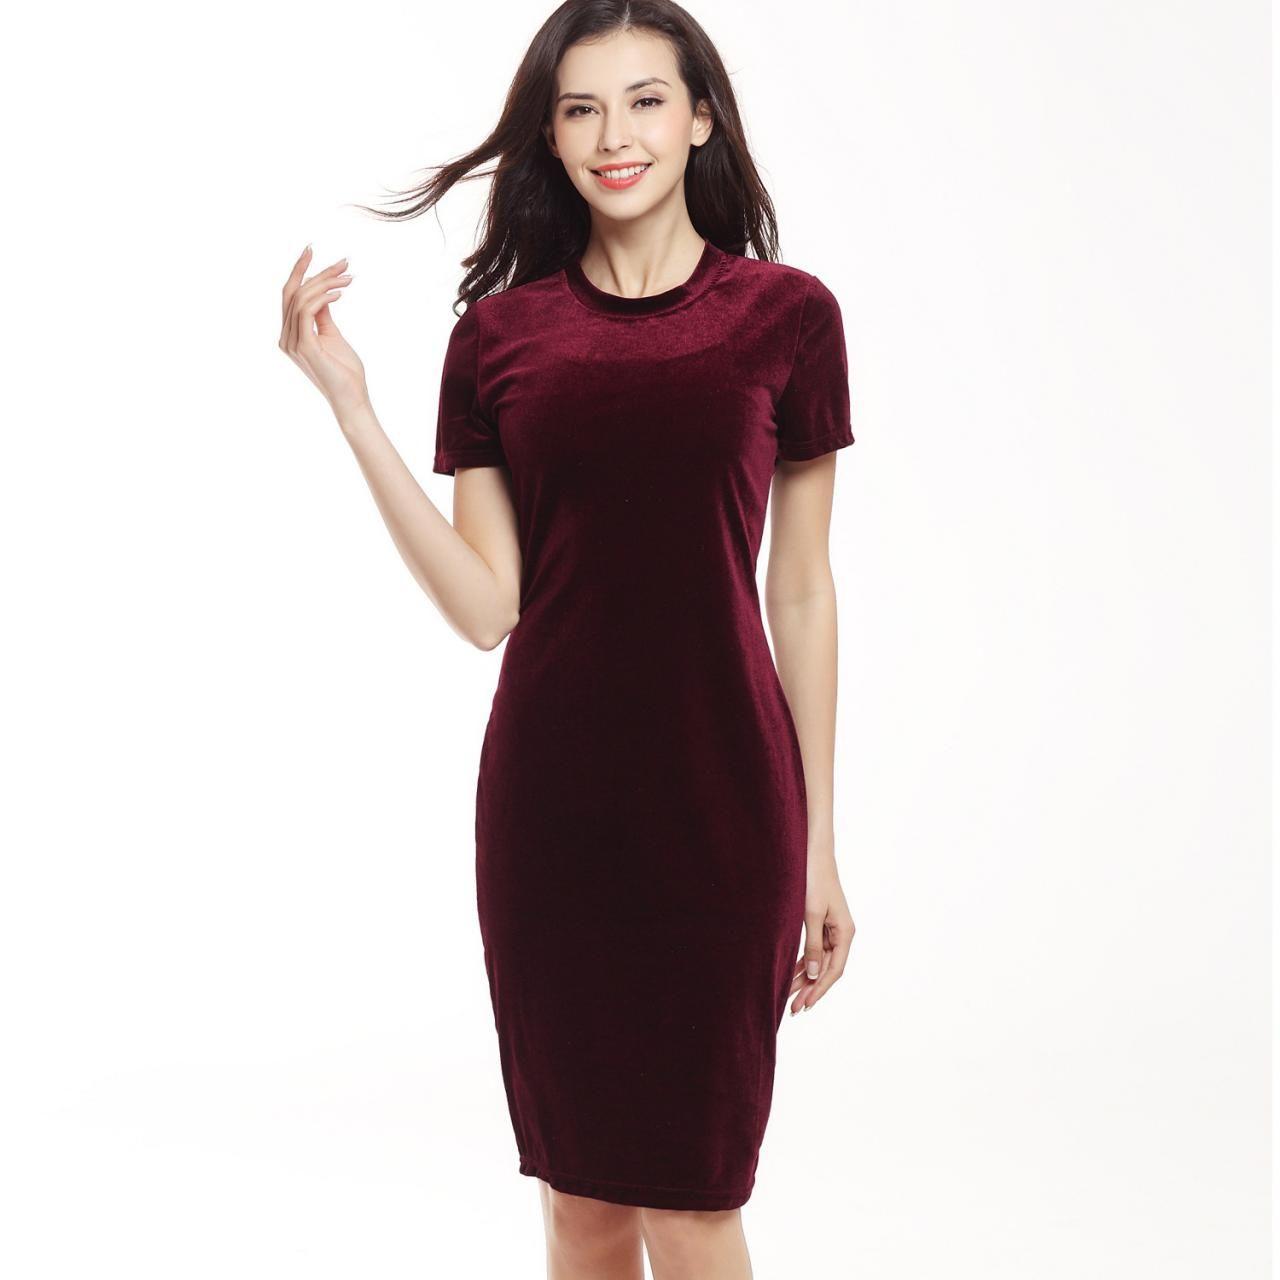 Pleuche Short Sleeve Scoop Slim Knee-length Dress